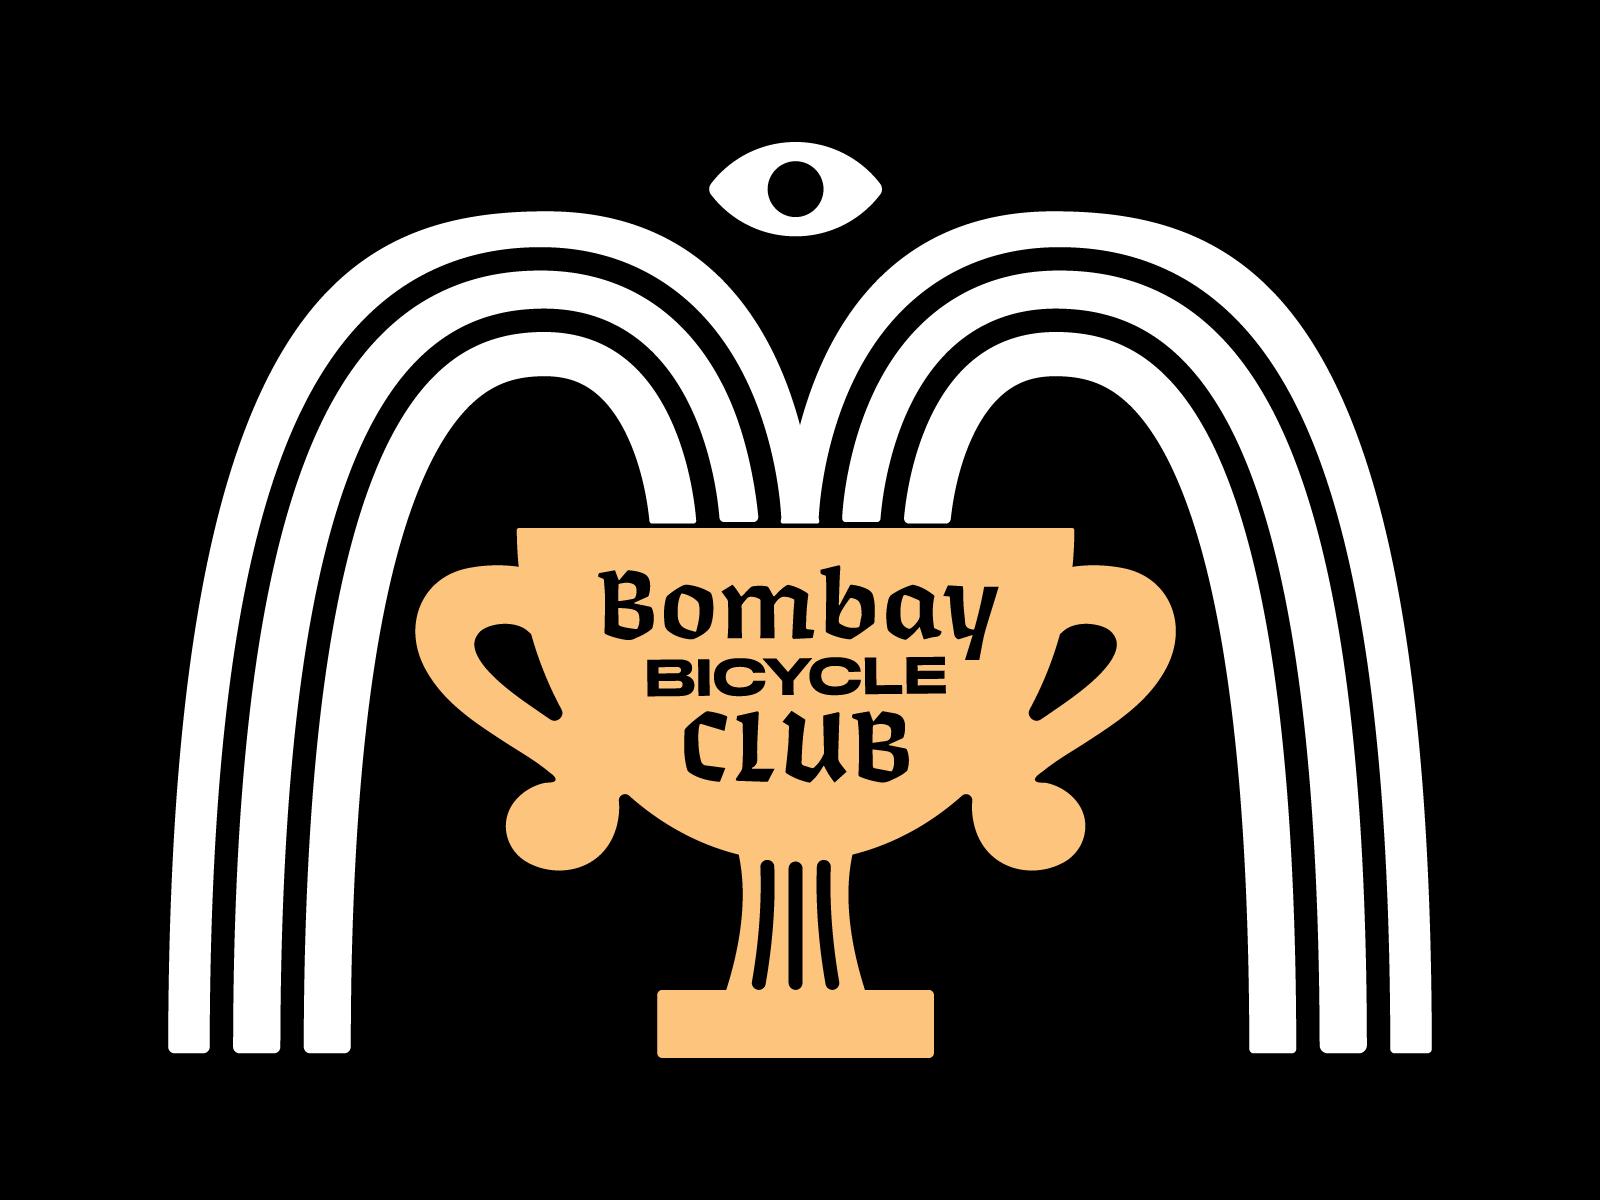 Bombaybicycleclub 4x